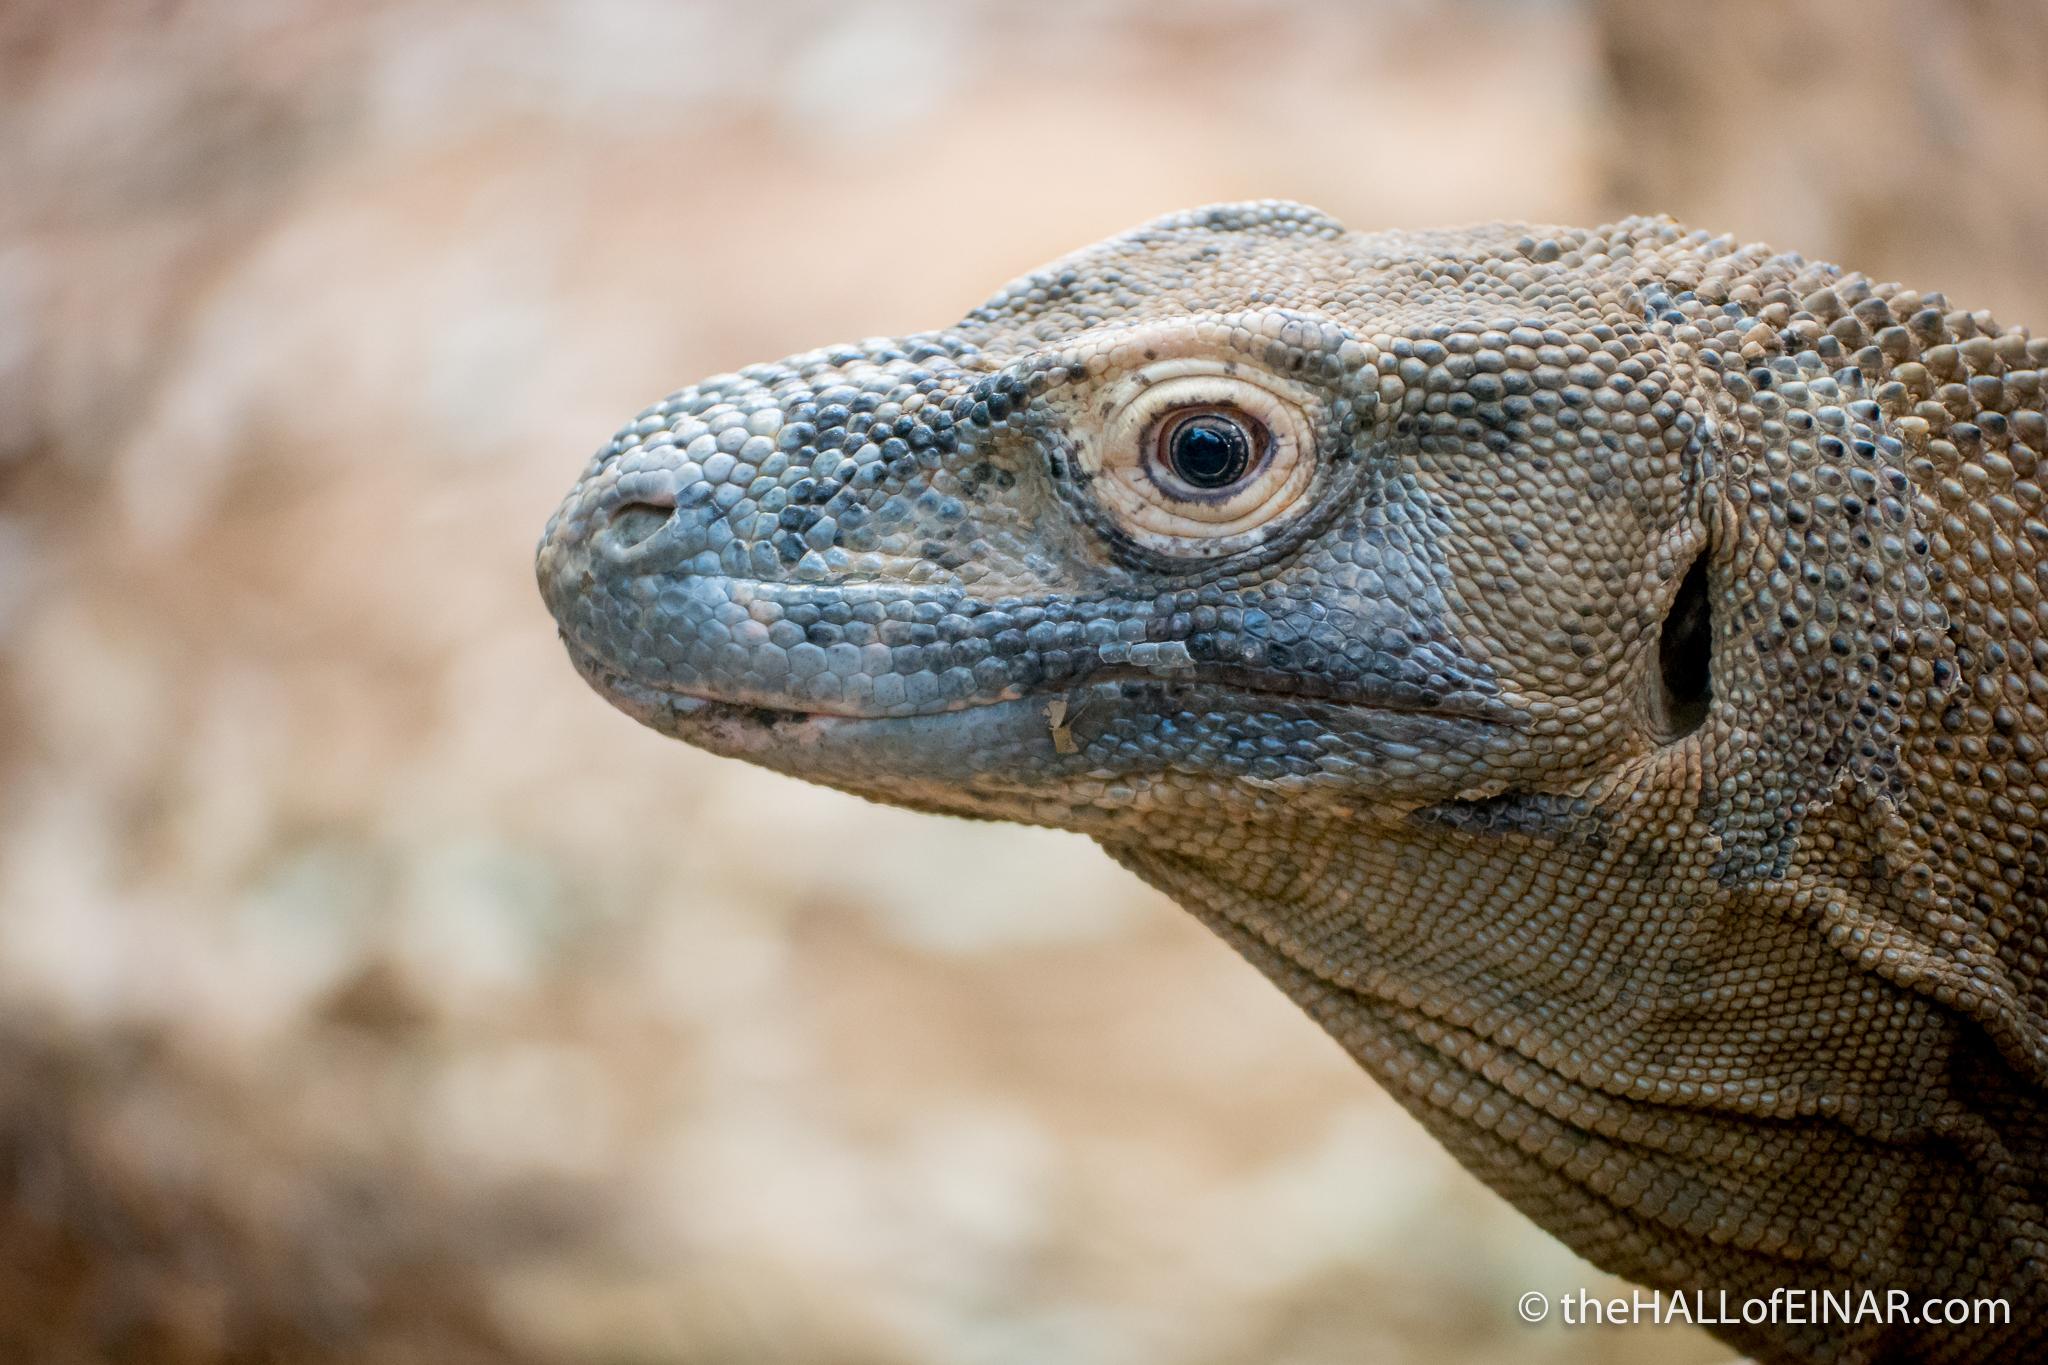 Komodo Dragon - Varanus komodoensis - The Hall of Einar - photograph (c) David Bailey (not the)